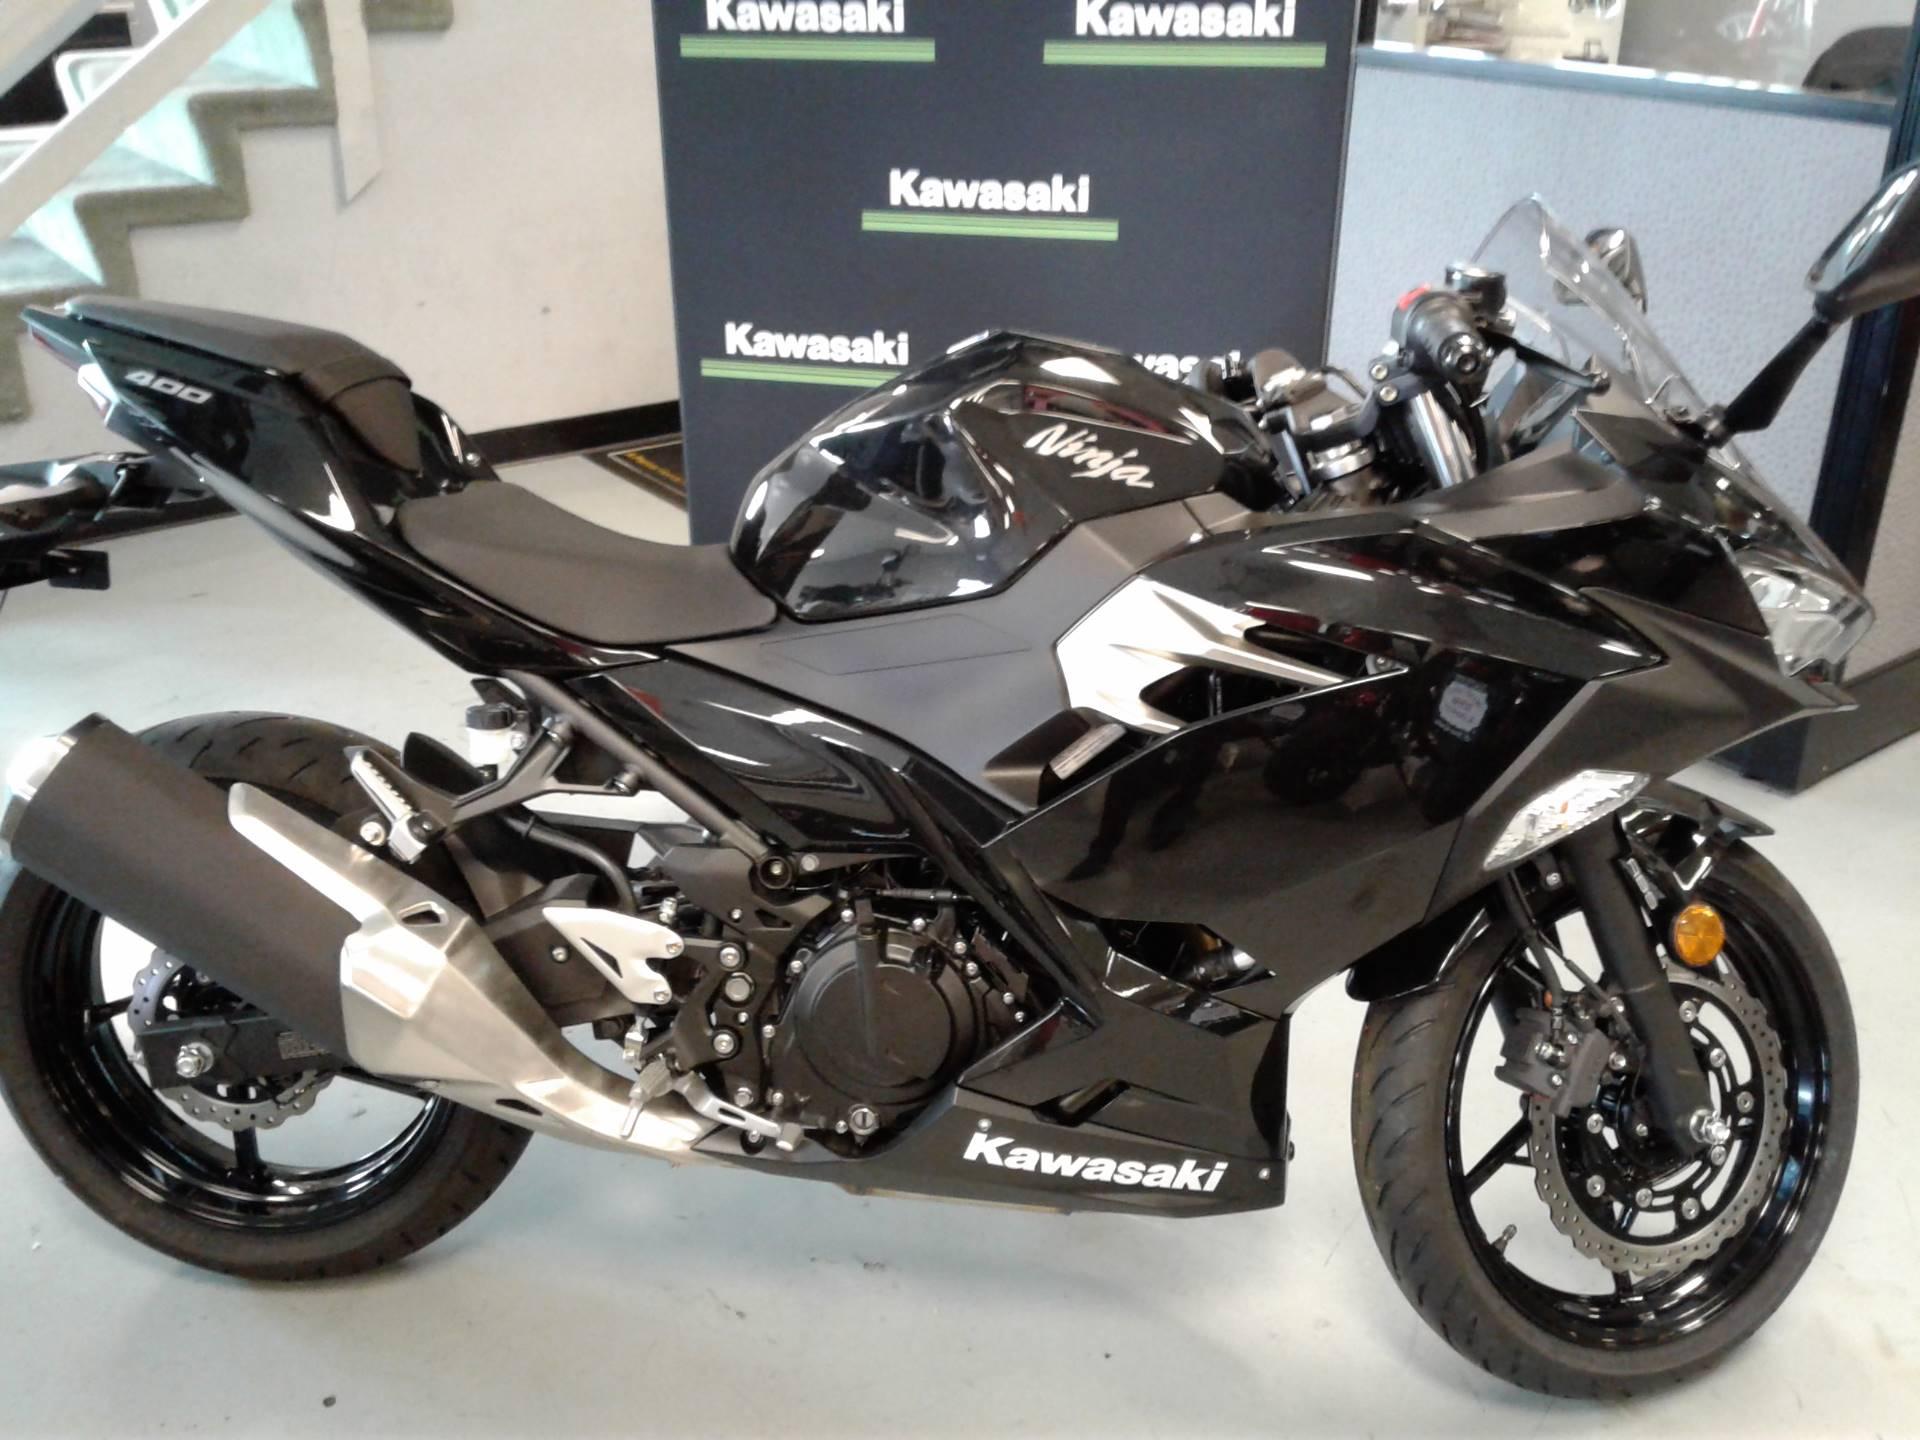 New 2018 Kawasaki Ninja 400 ABS Motorcycles in Orange, CA | Stock ...